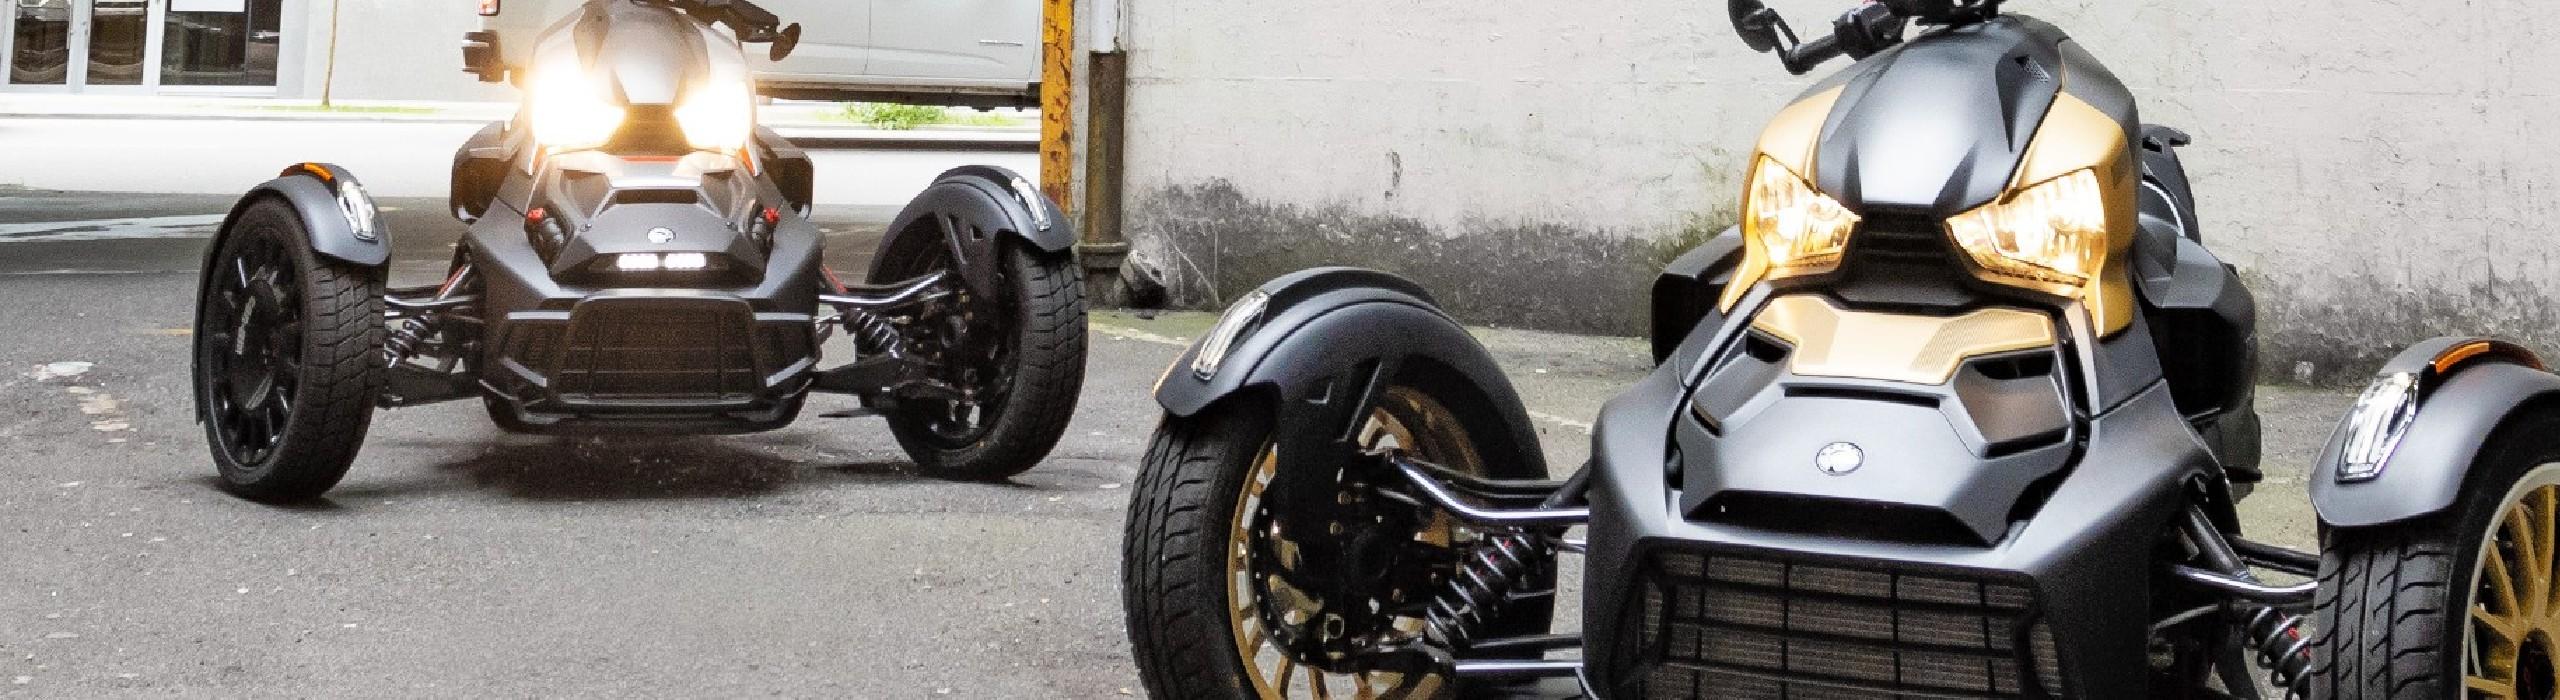 Can-Am RYKER EDITION RALLYE - Moto 3 roues 2020 - Sas Chossade Busato Motoneiges et Quads (73 et 74)